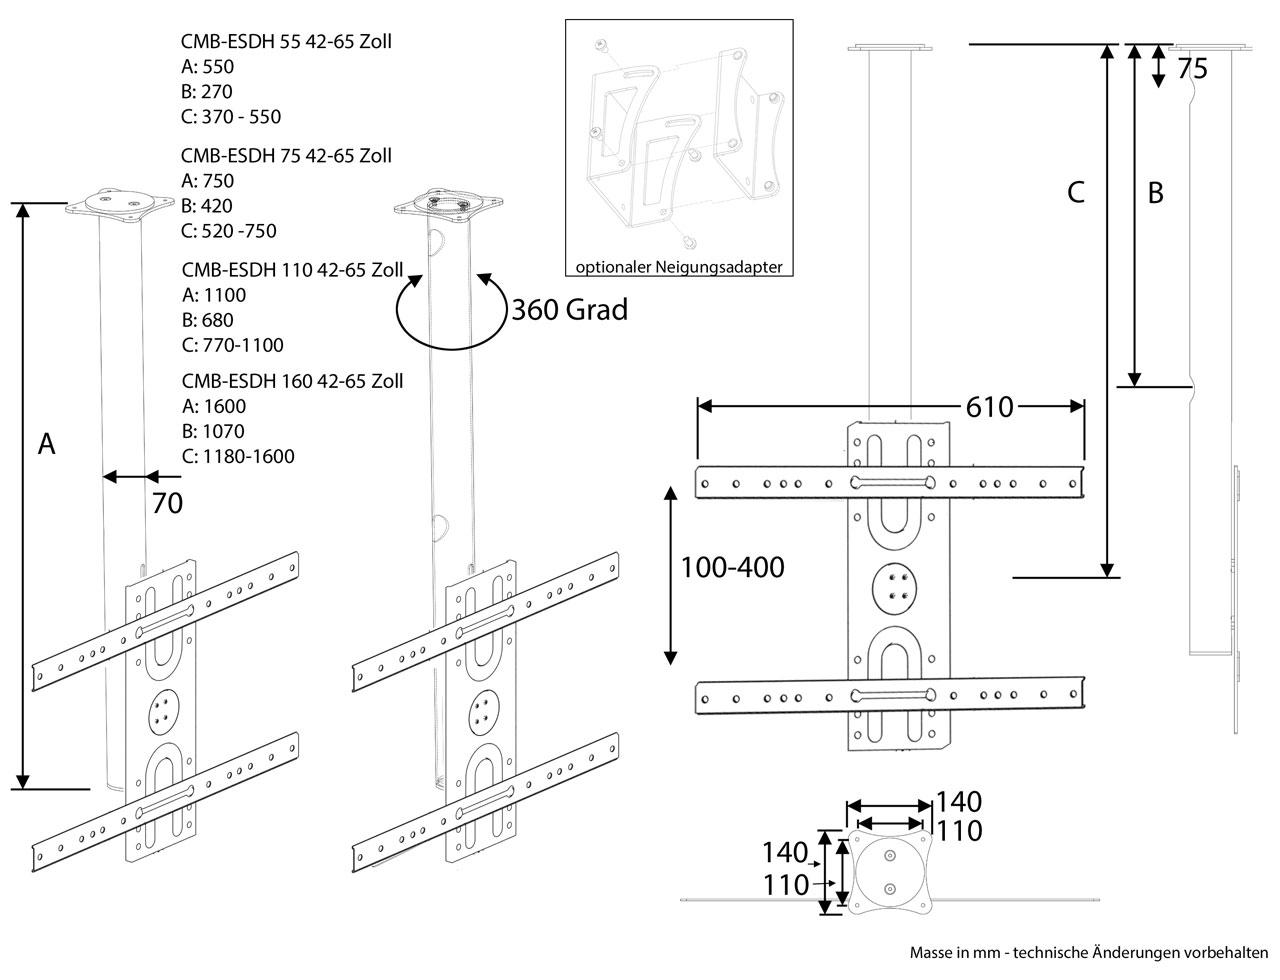 edelstahl tv deckenhalterung cmb esdh 42 65 zollg nstig kaufen cmb systeme. Black Bedroom Furniture Sets. Home Design Ideas